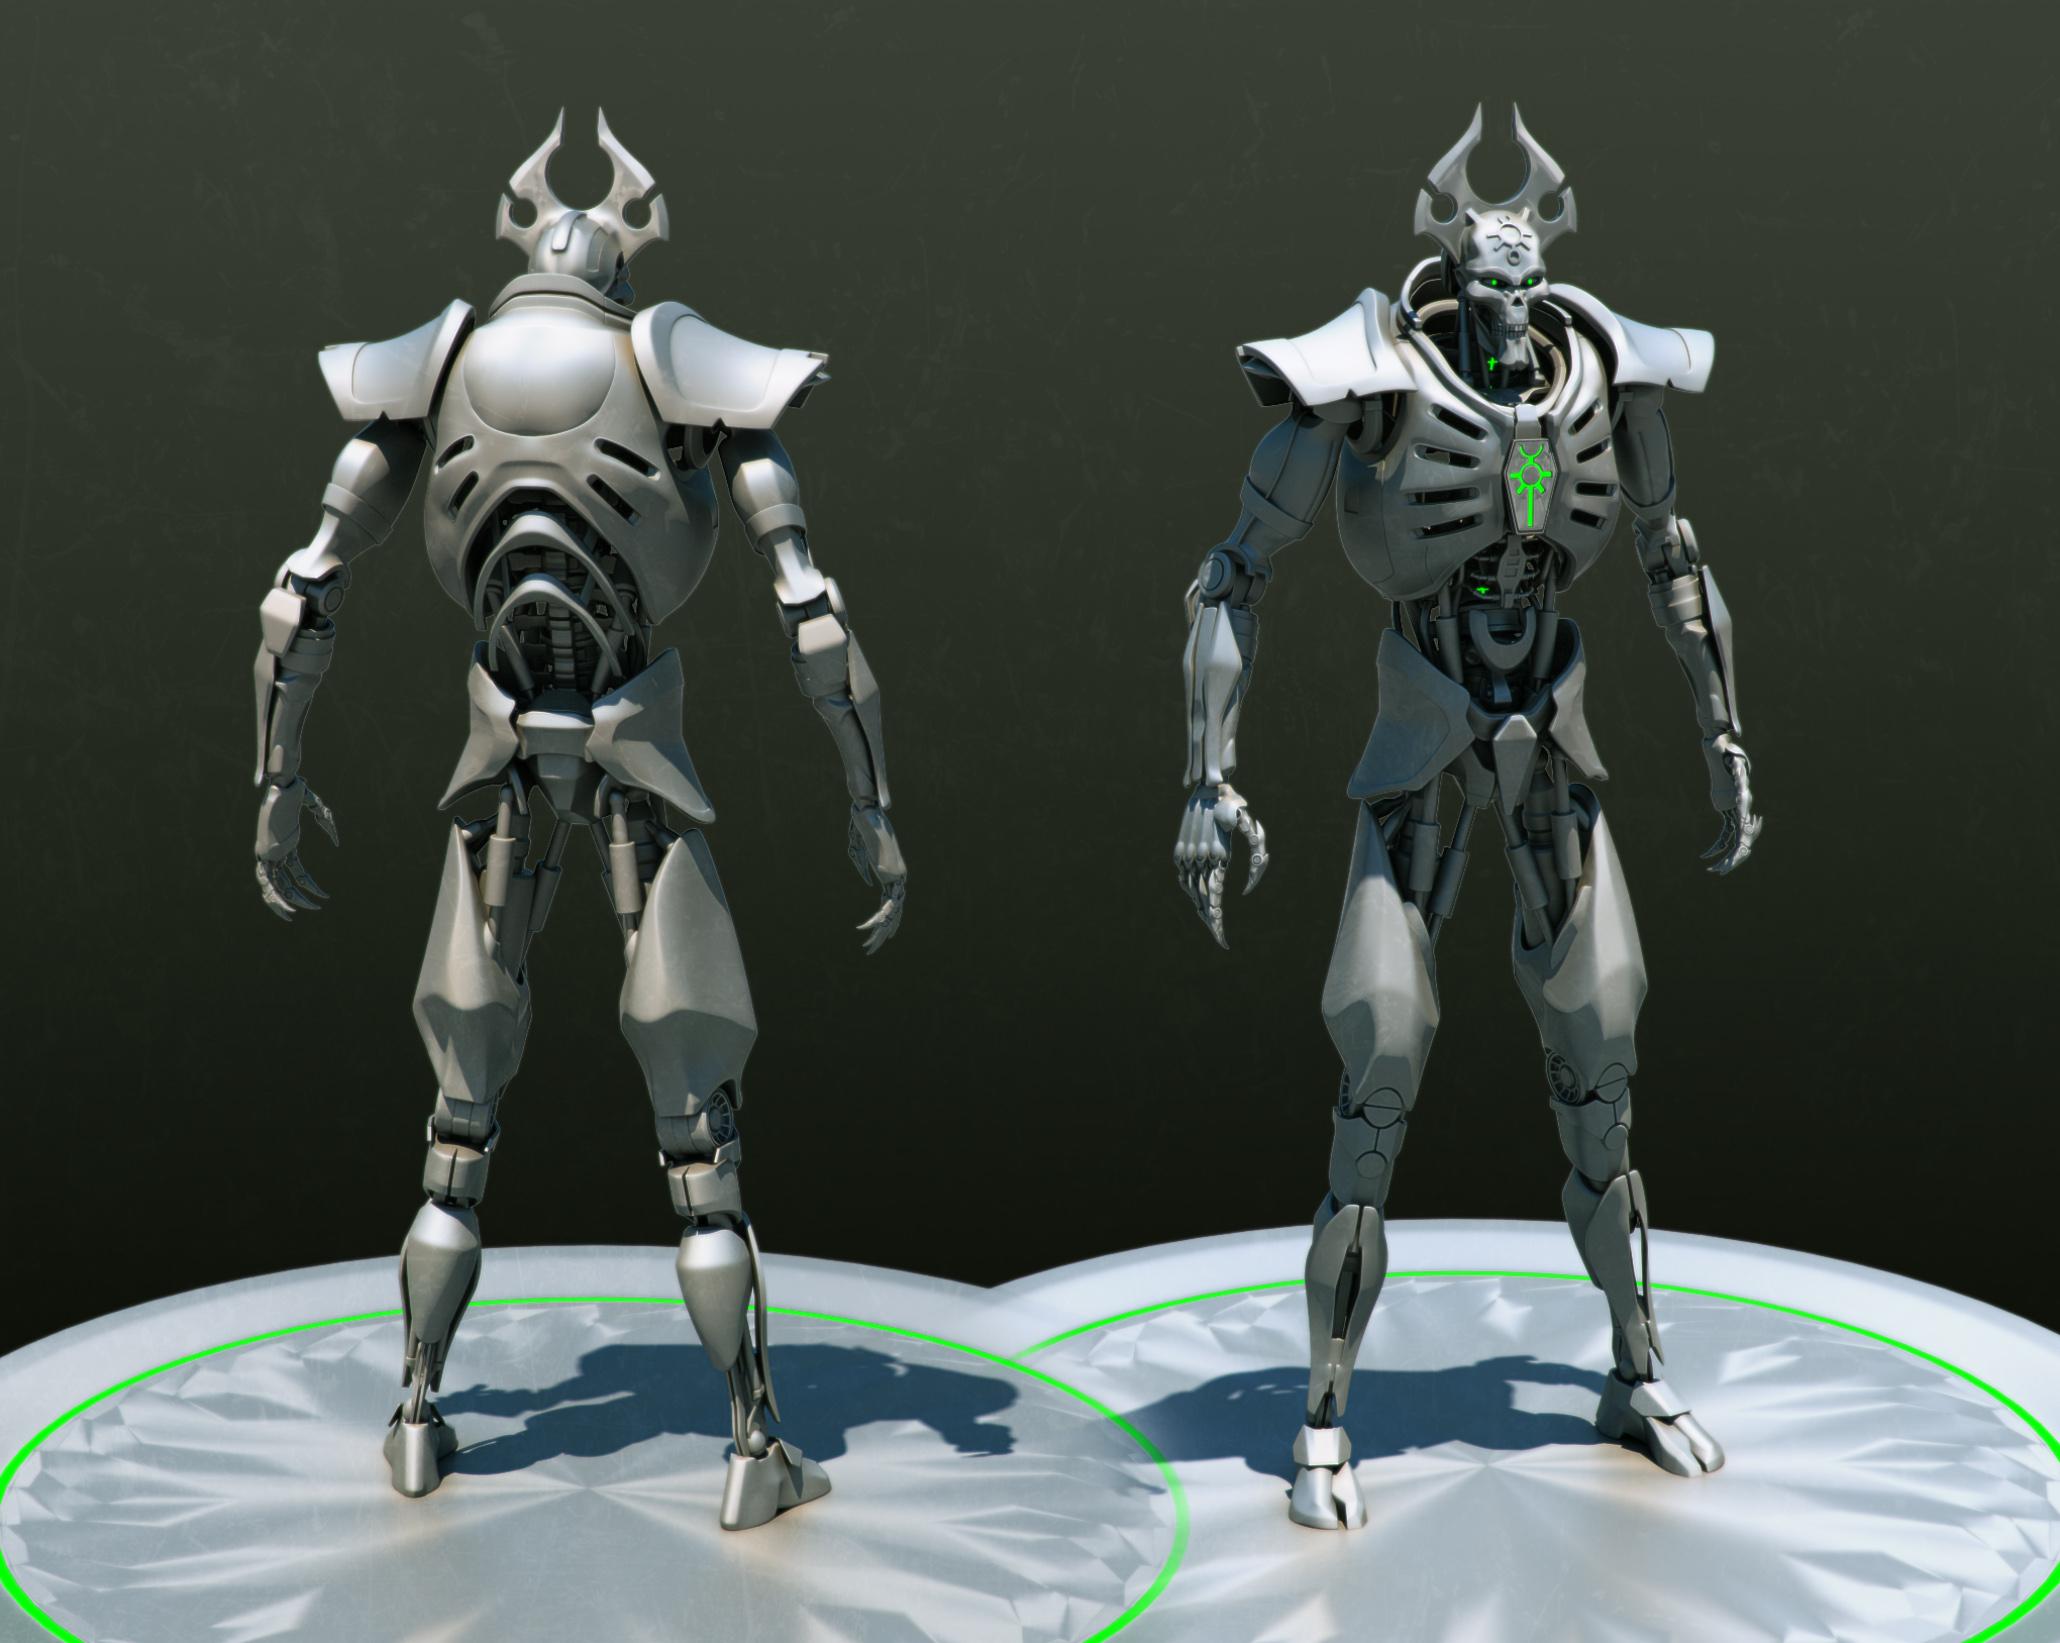 Necron lord WIP by Avitus12 on DeviantArt